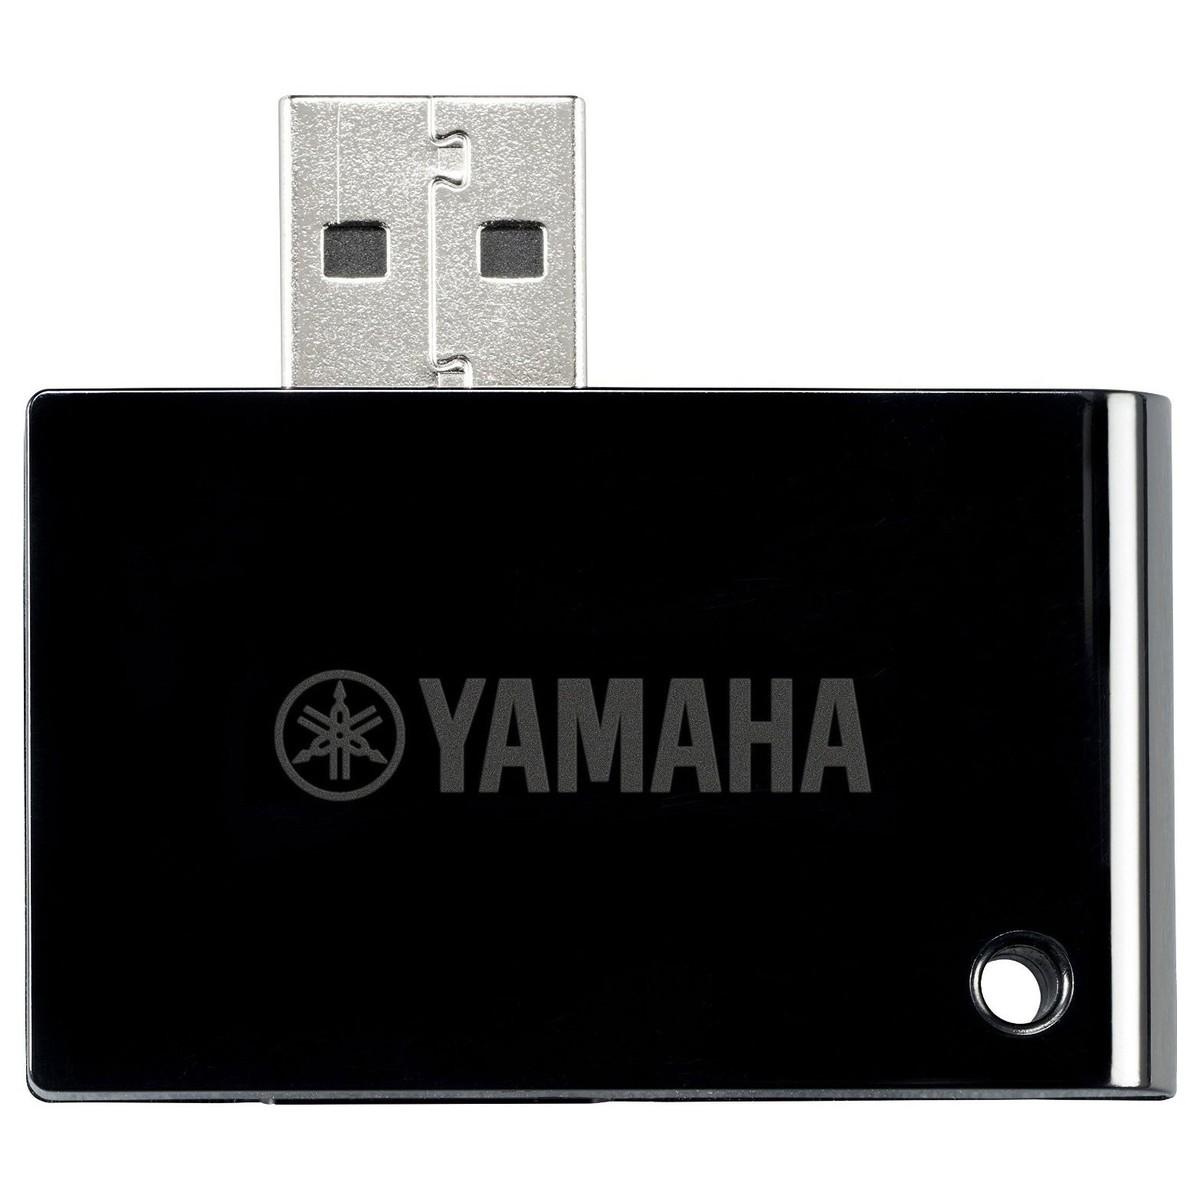 Yamaha Ud Bt01 Usb Bluetooth Adaptor At Gear4music Dongle Midi Loading Zoom